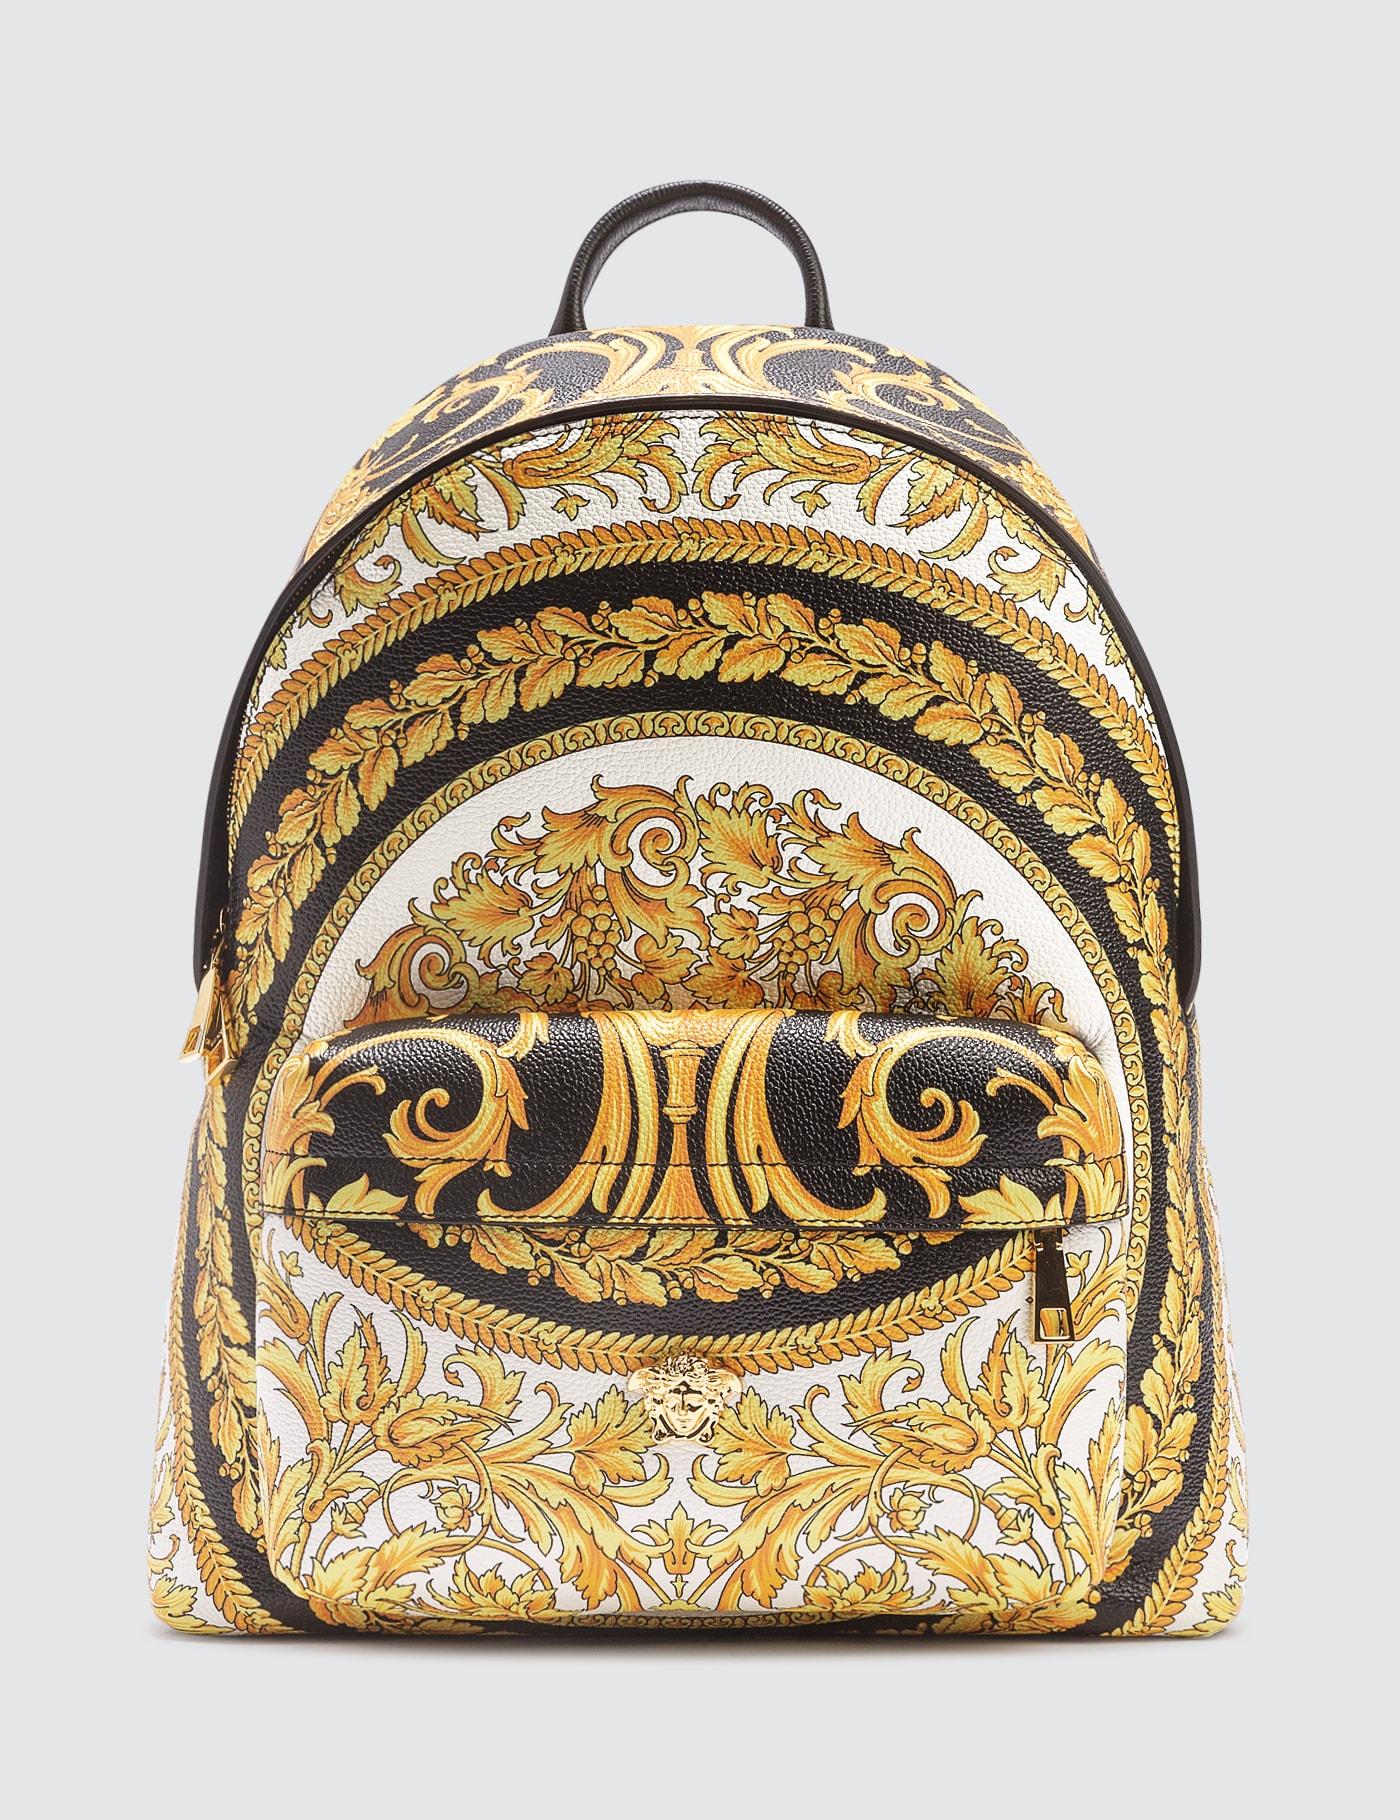 Gold Barocco Print Backpack